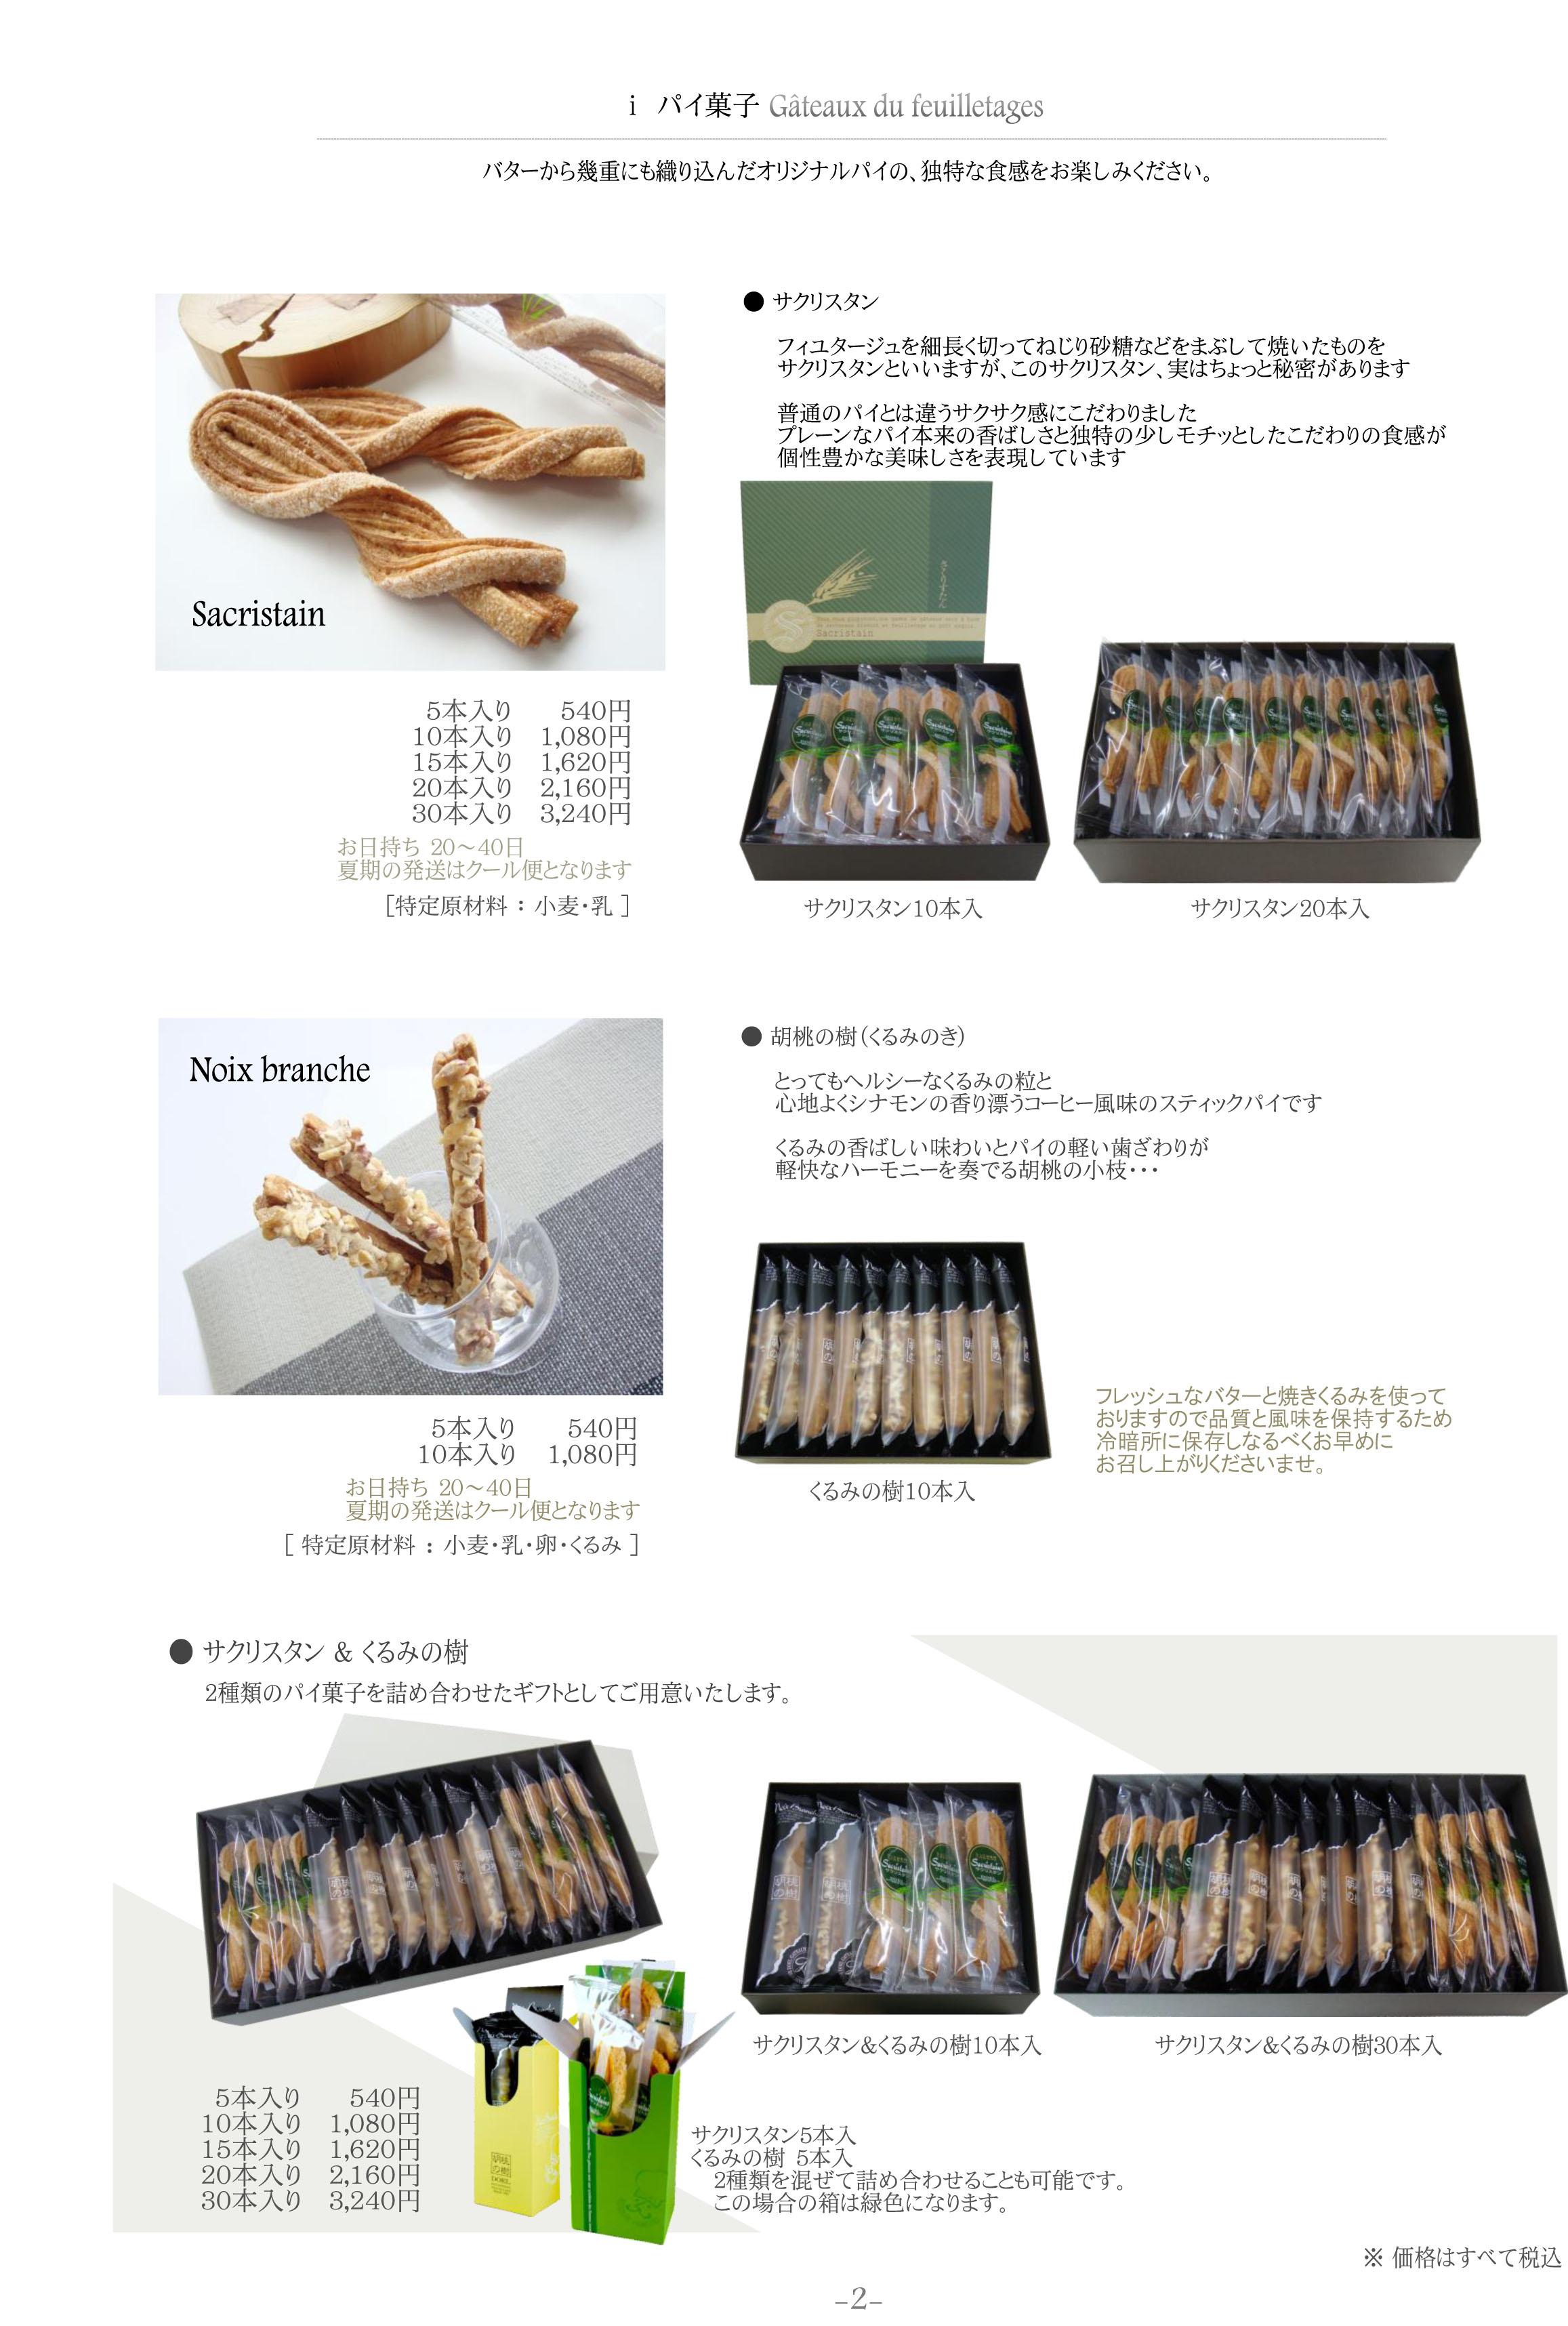 1700505 catalog_02